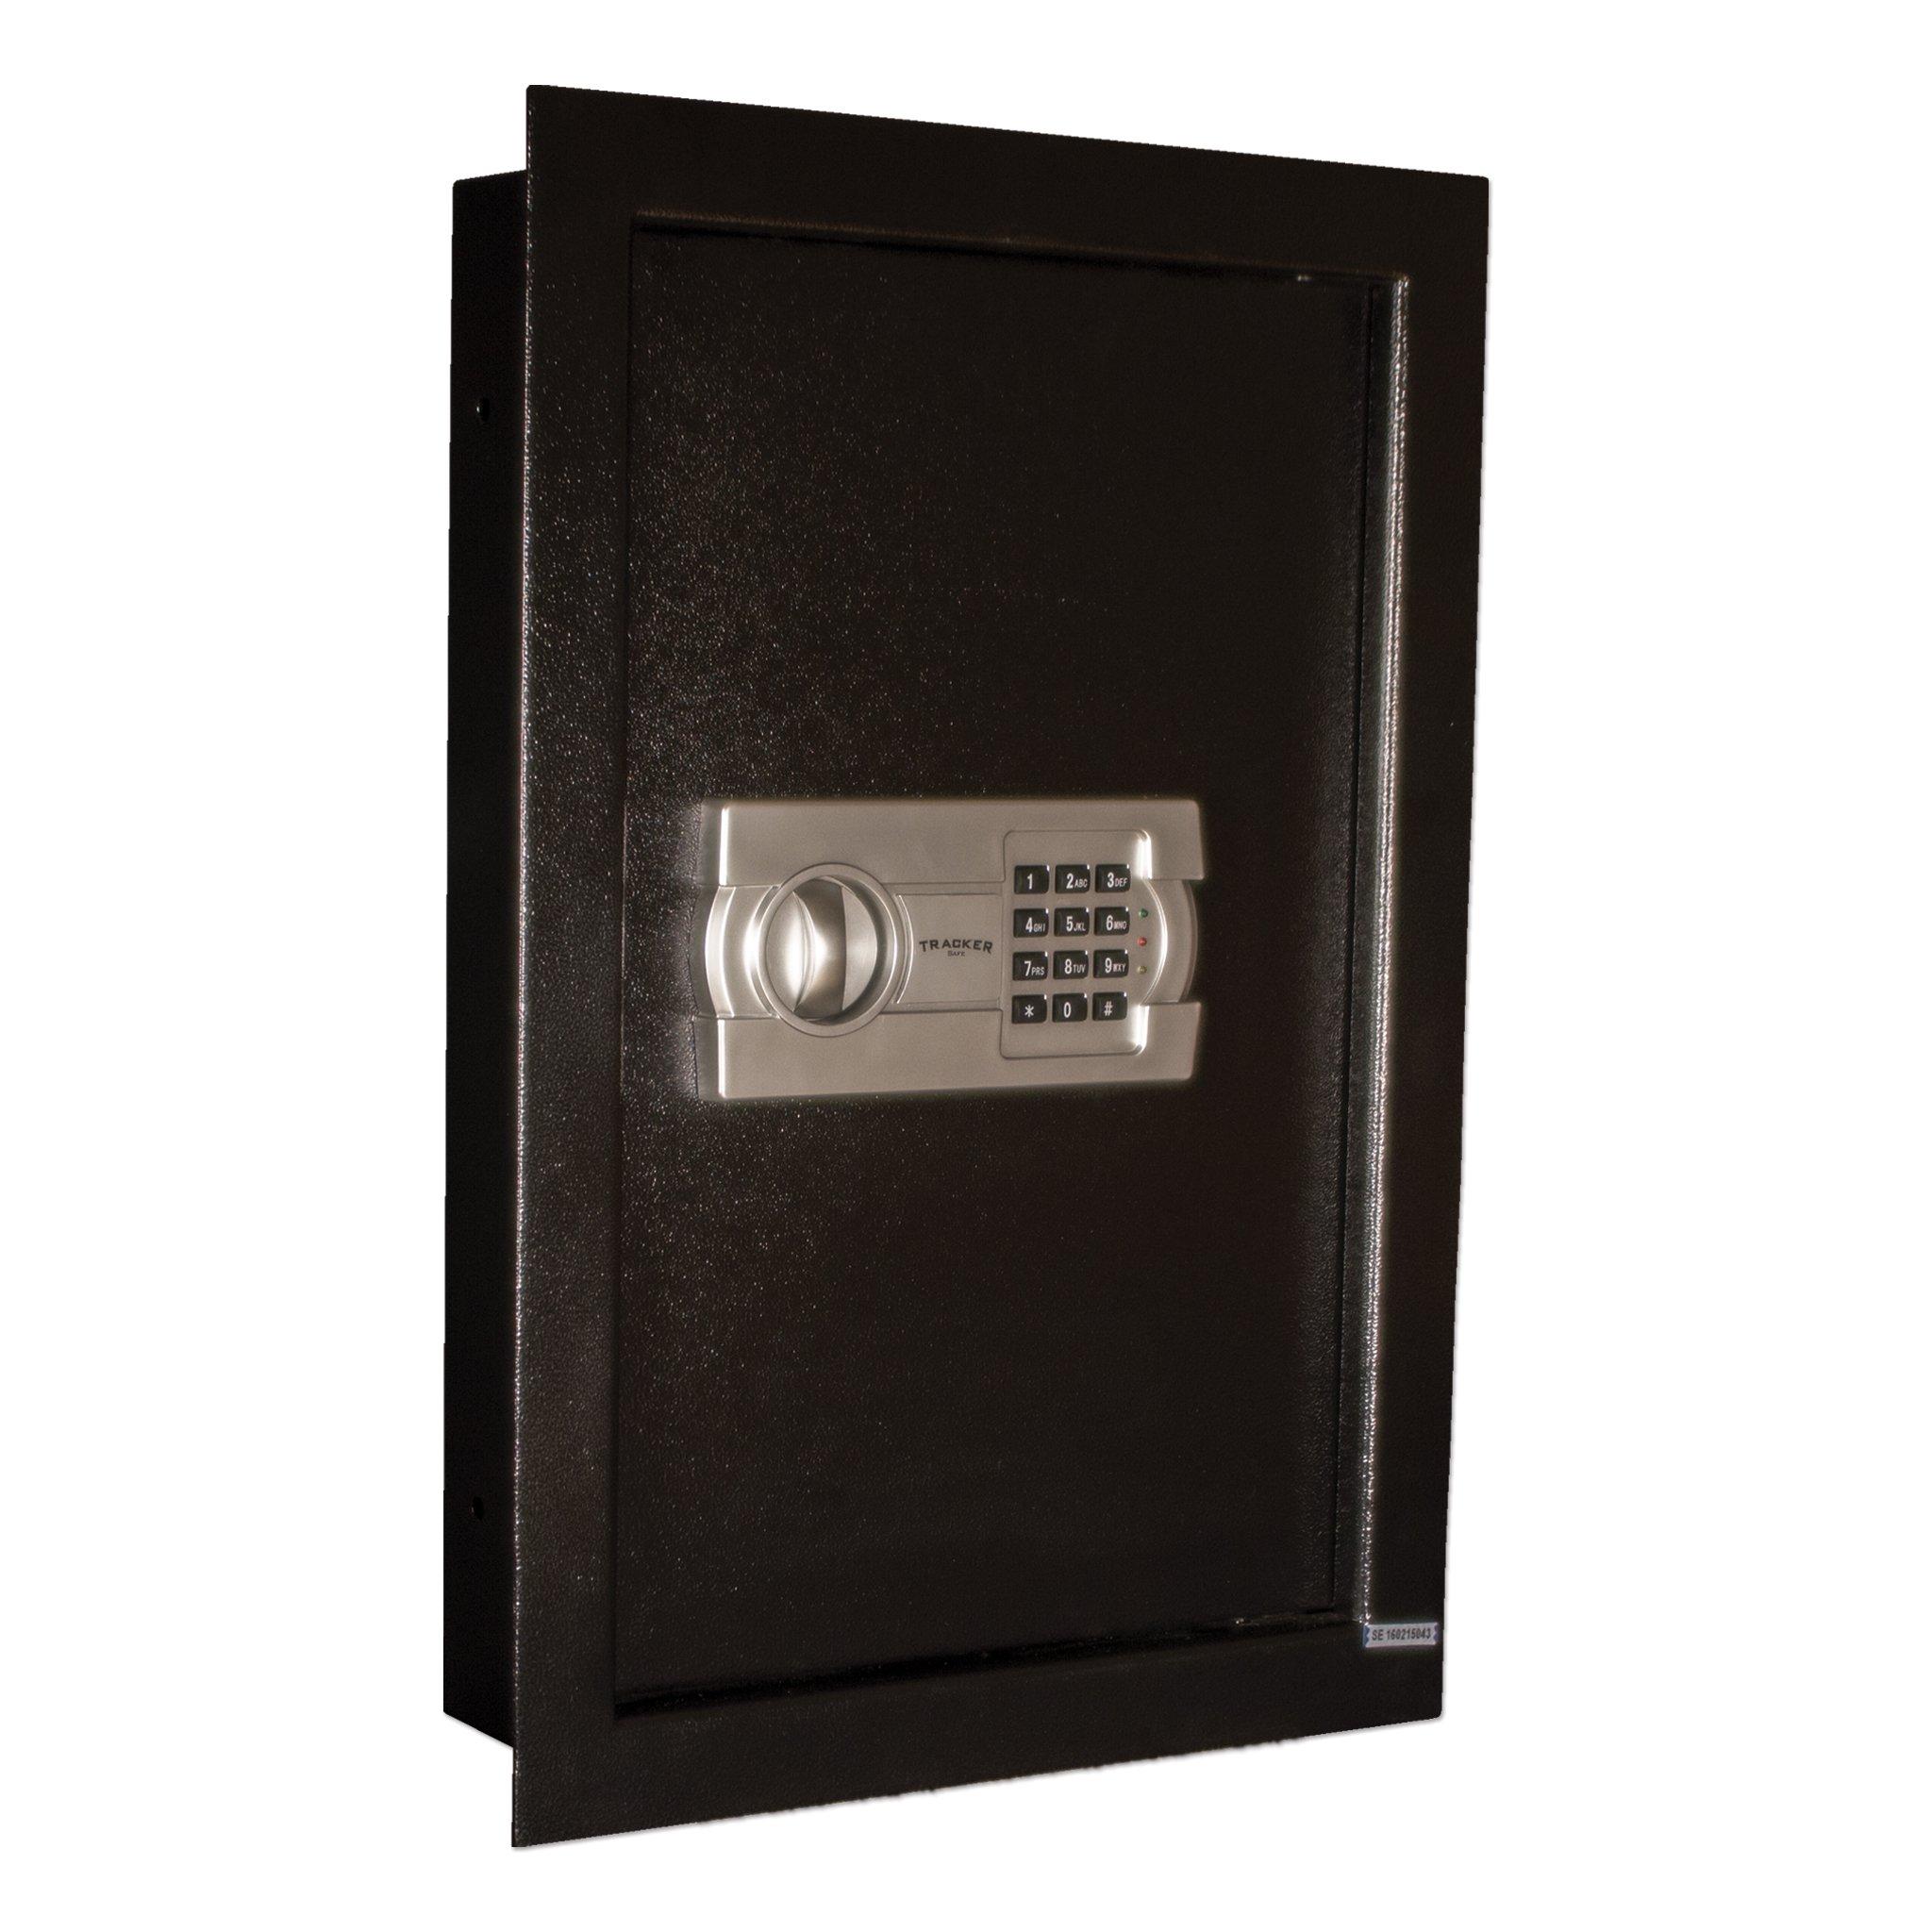 Tracker Safe WS211404-E Steel Wall Safe, Electronic Lock, Black Powder Coat Paint, 0.60 cu. ft. by Tracker Safe